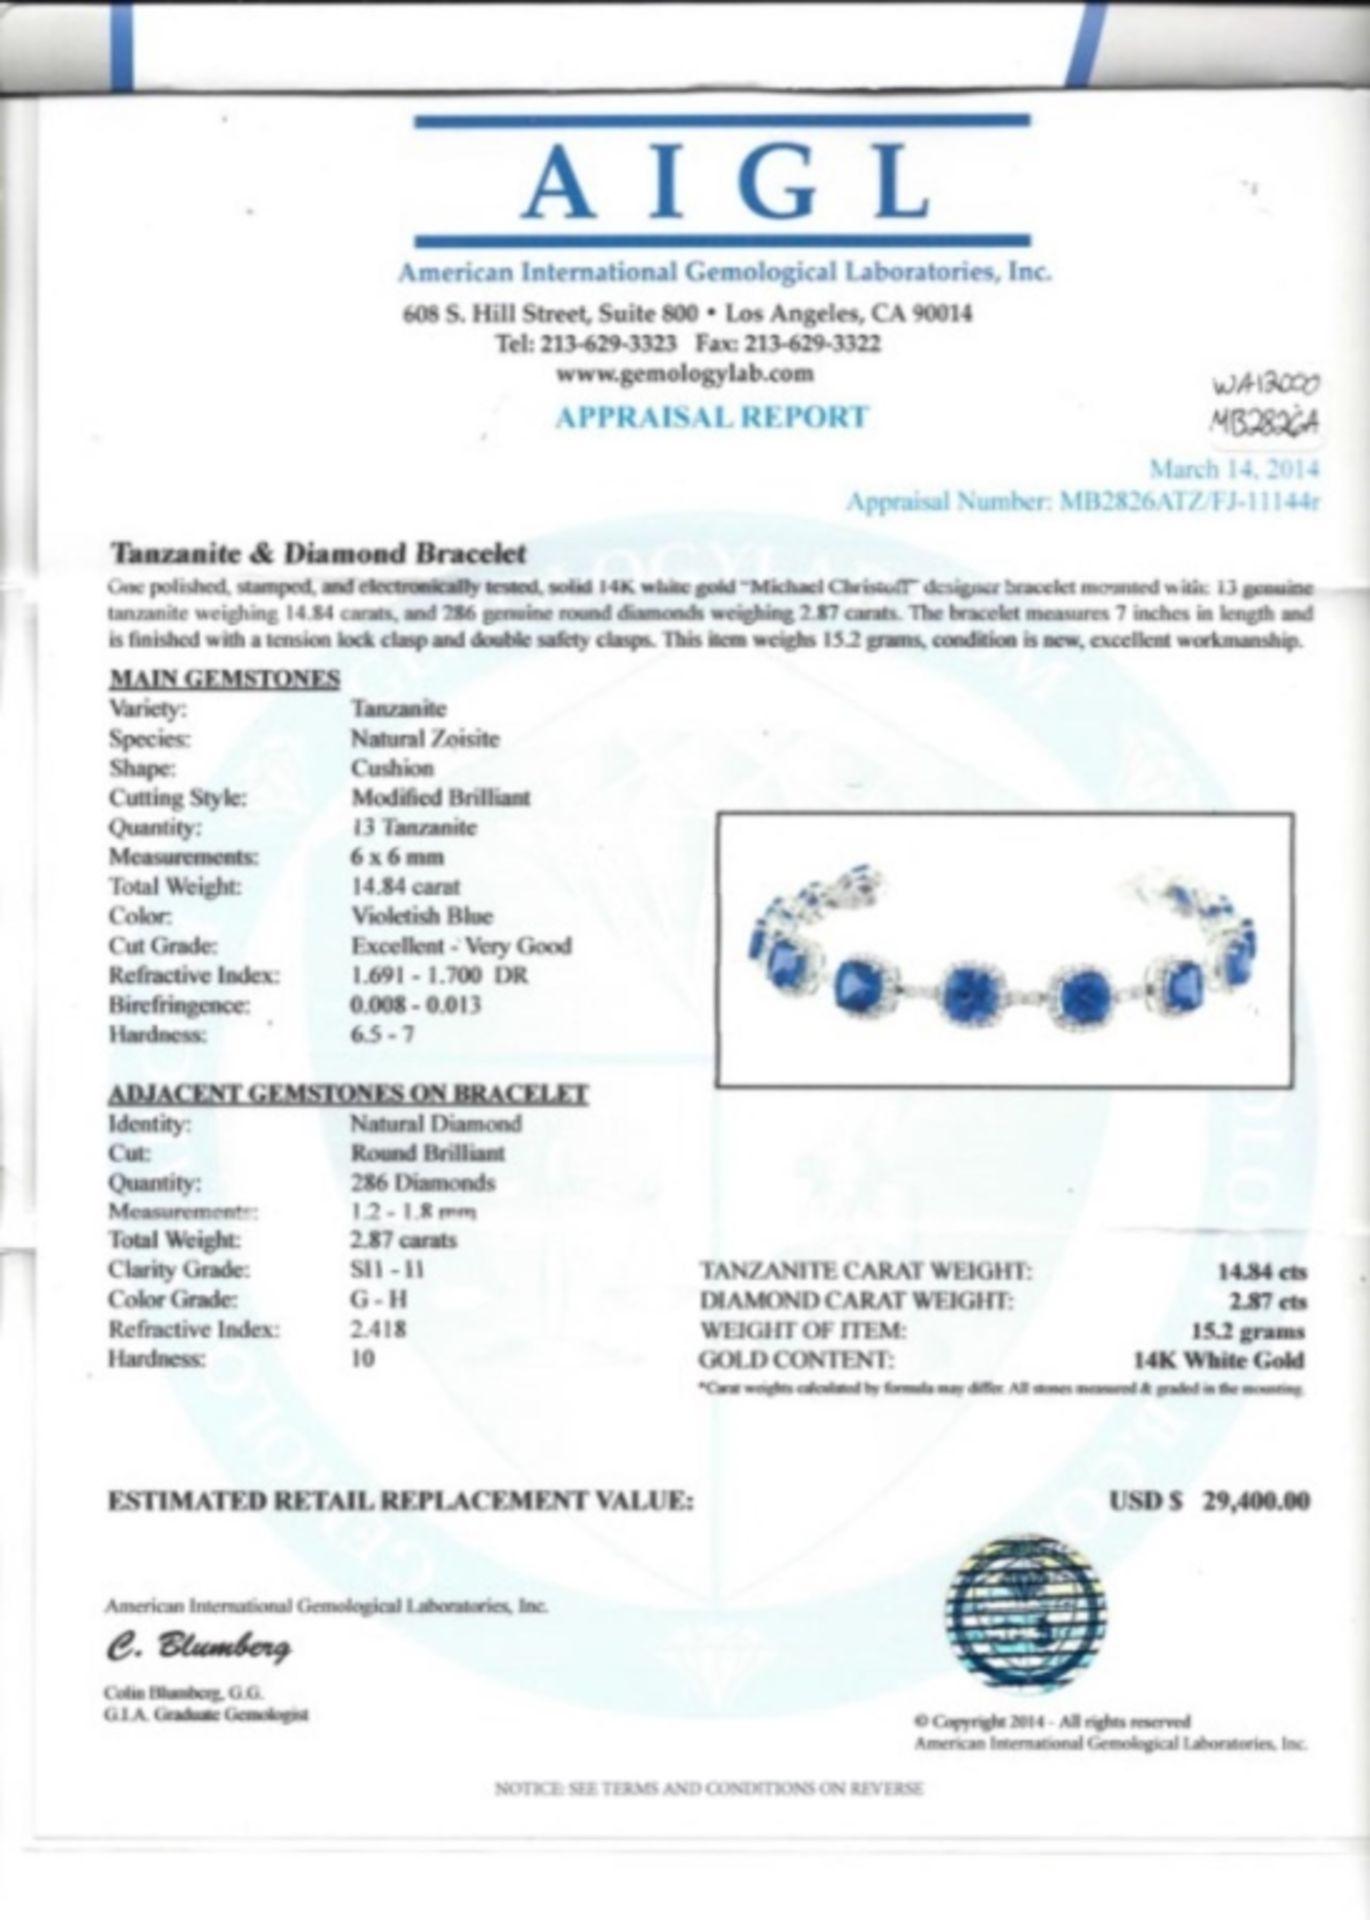 14K Gold 14.84ctw Tanzanite & 2.87ctw Diamond Brac - Image 3 of 3